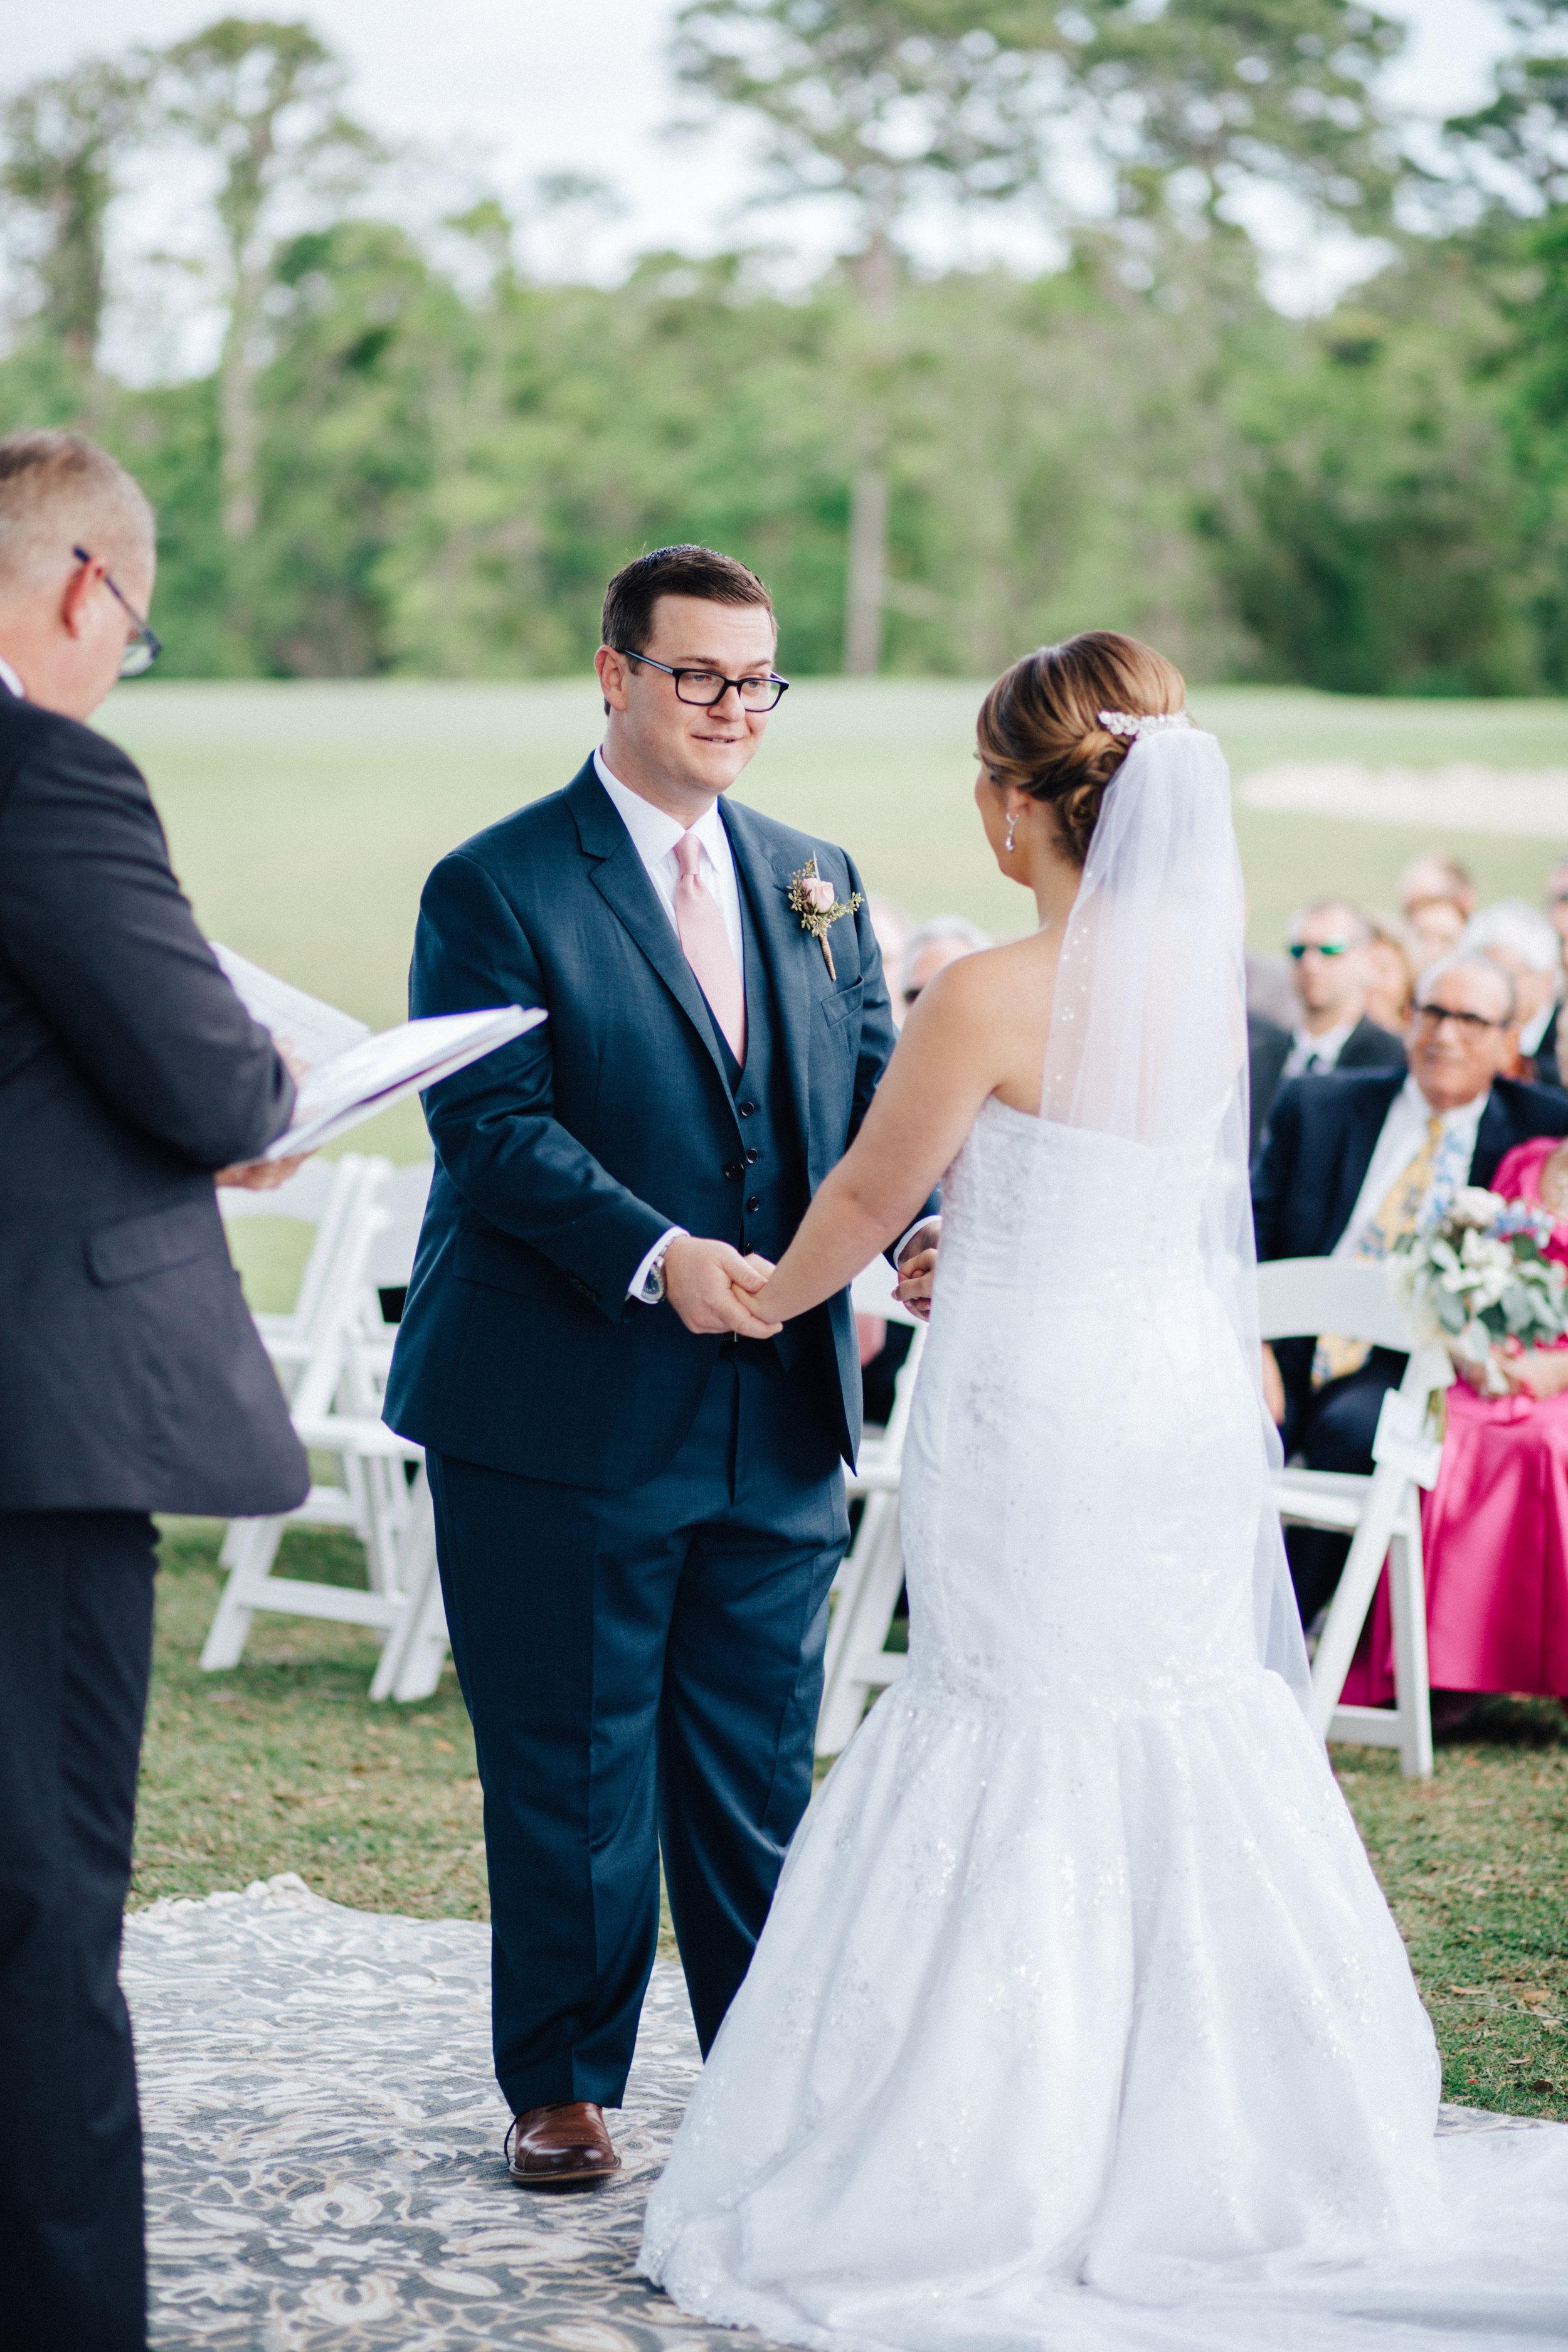 Tuskawilla Country Club Wedding Photographer-59.jpg